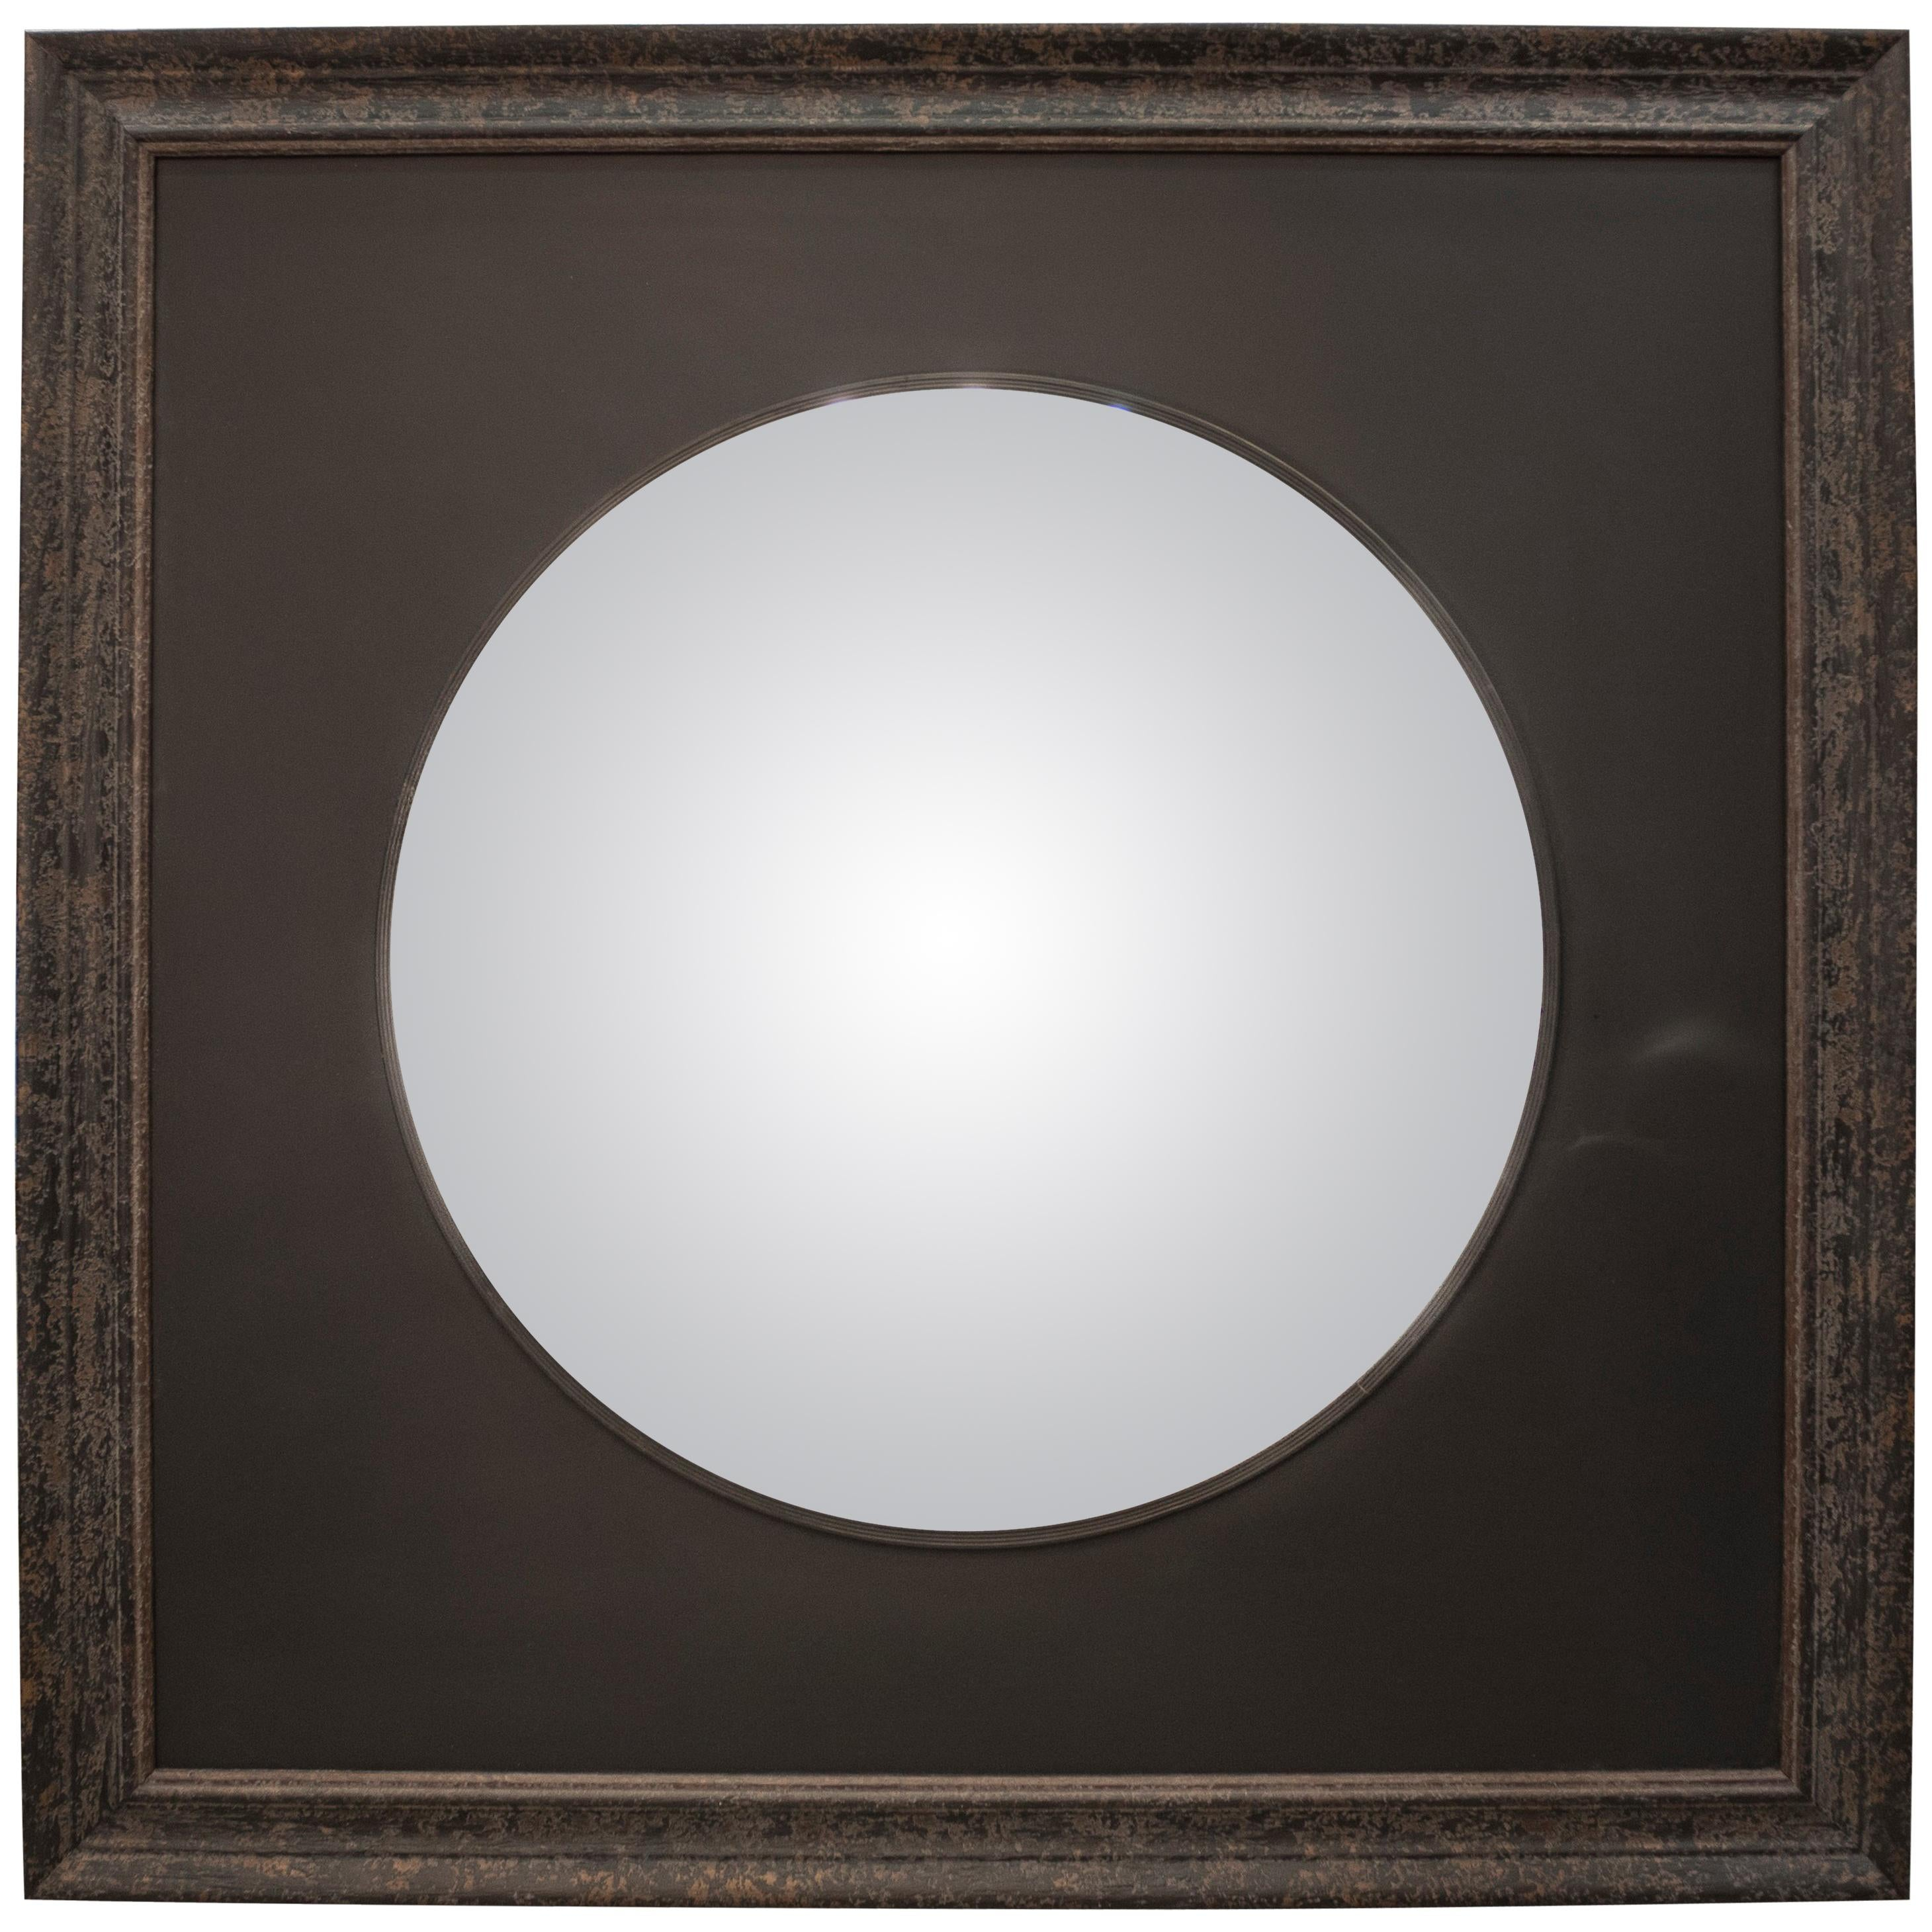 Black French Convex Mirror on black wood frame, France 2008